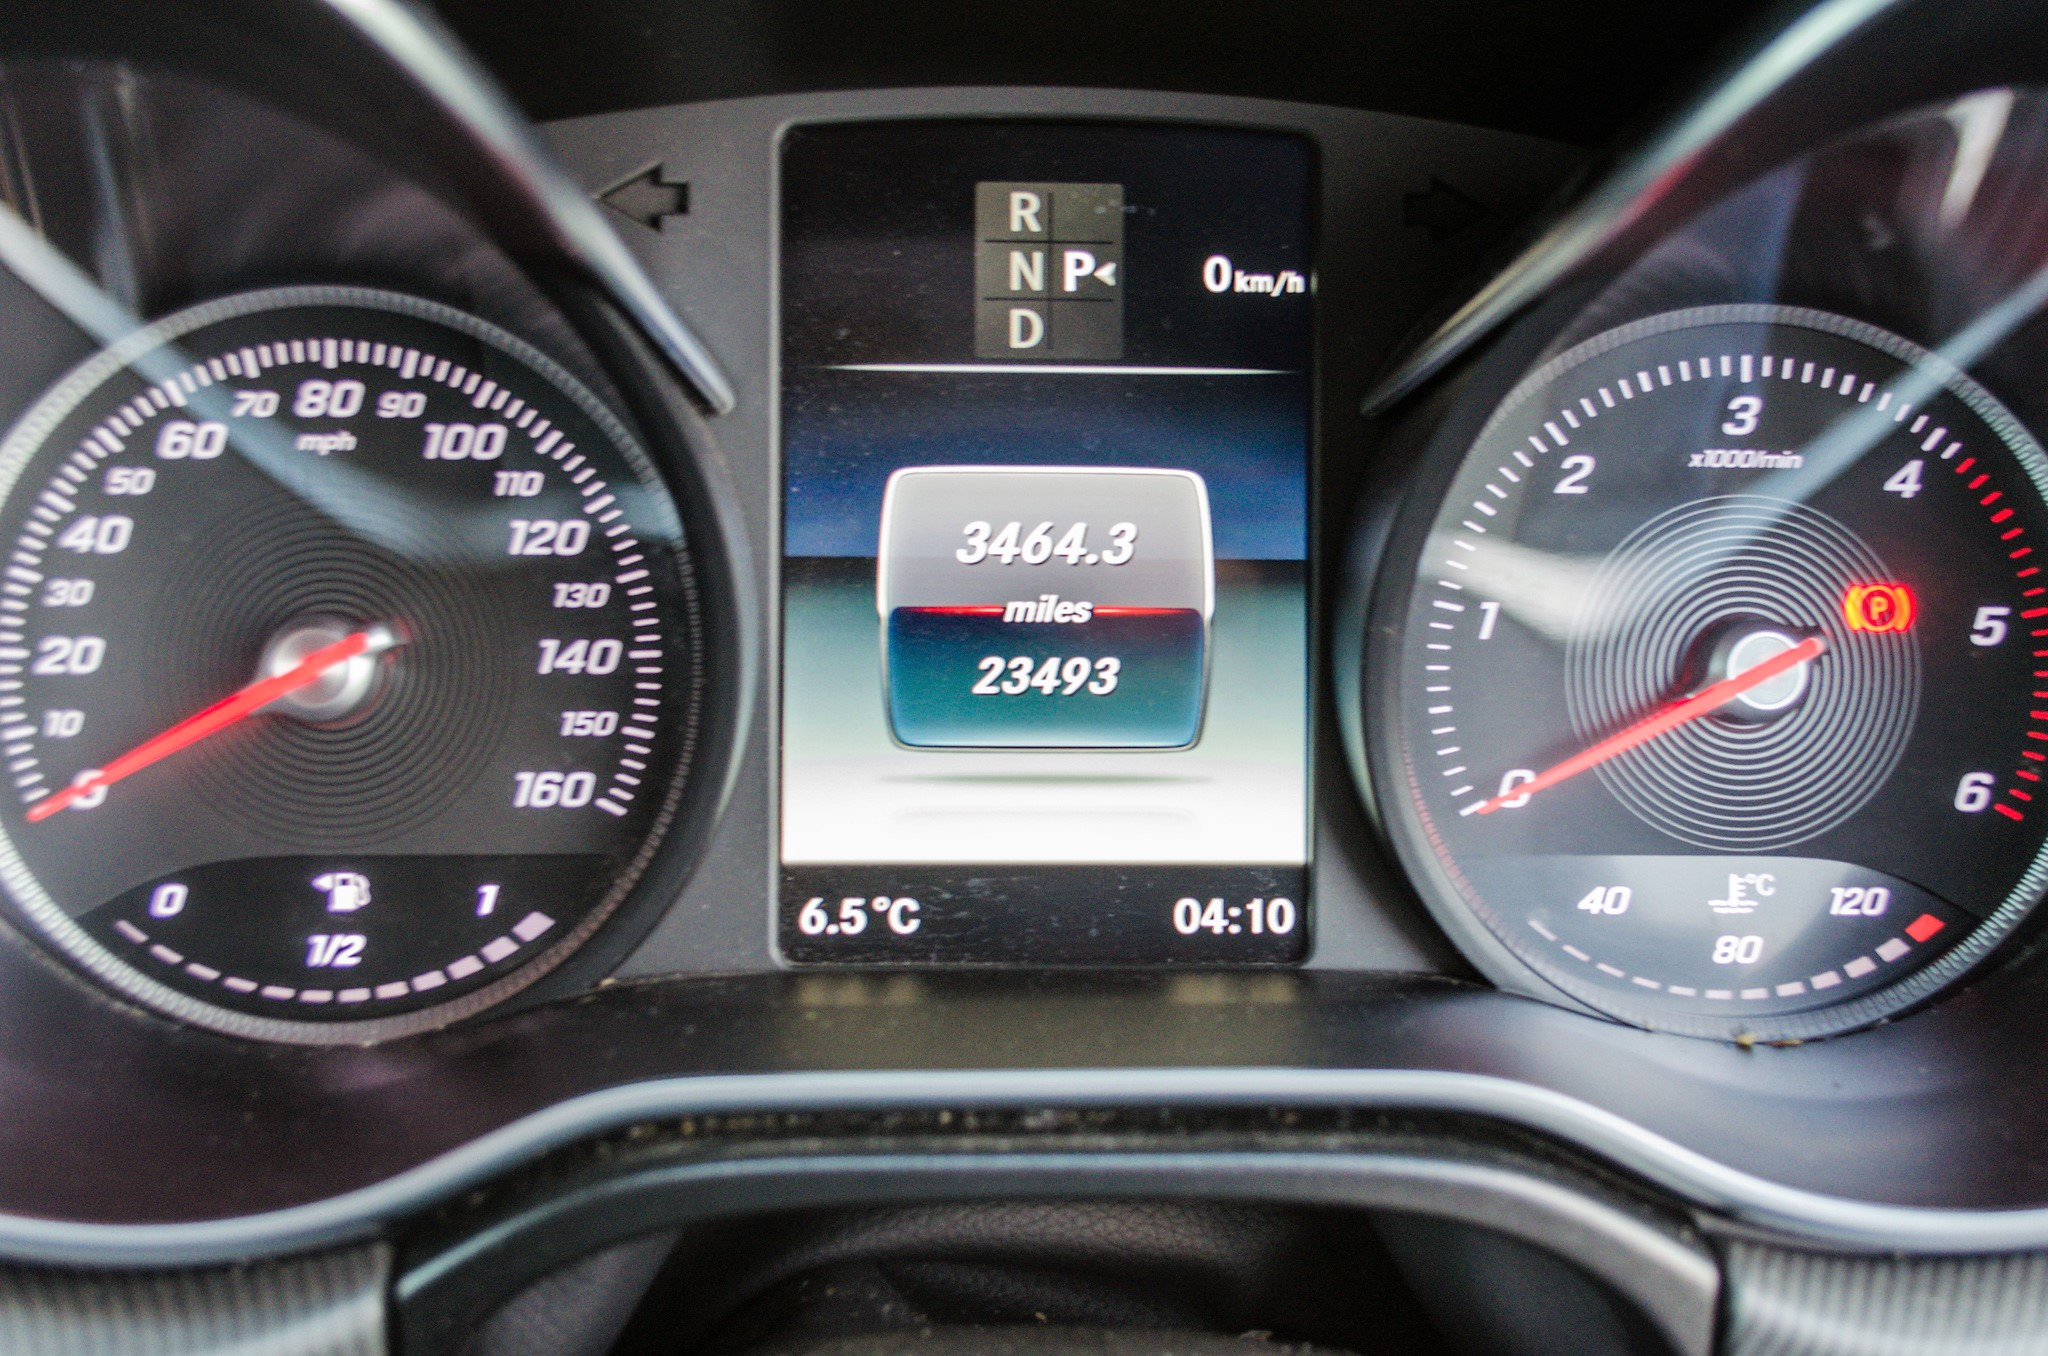 Mercedes Benz V250 Sport Bluetec XLWB auto diesel 8 seat MPV Reg No: FY68 JTO Date of First - Image 23 of 27